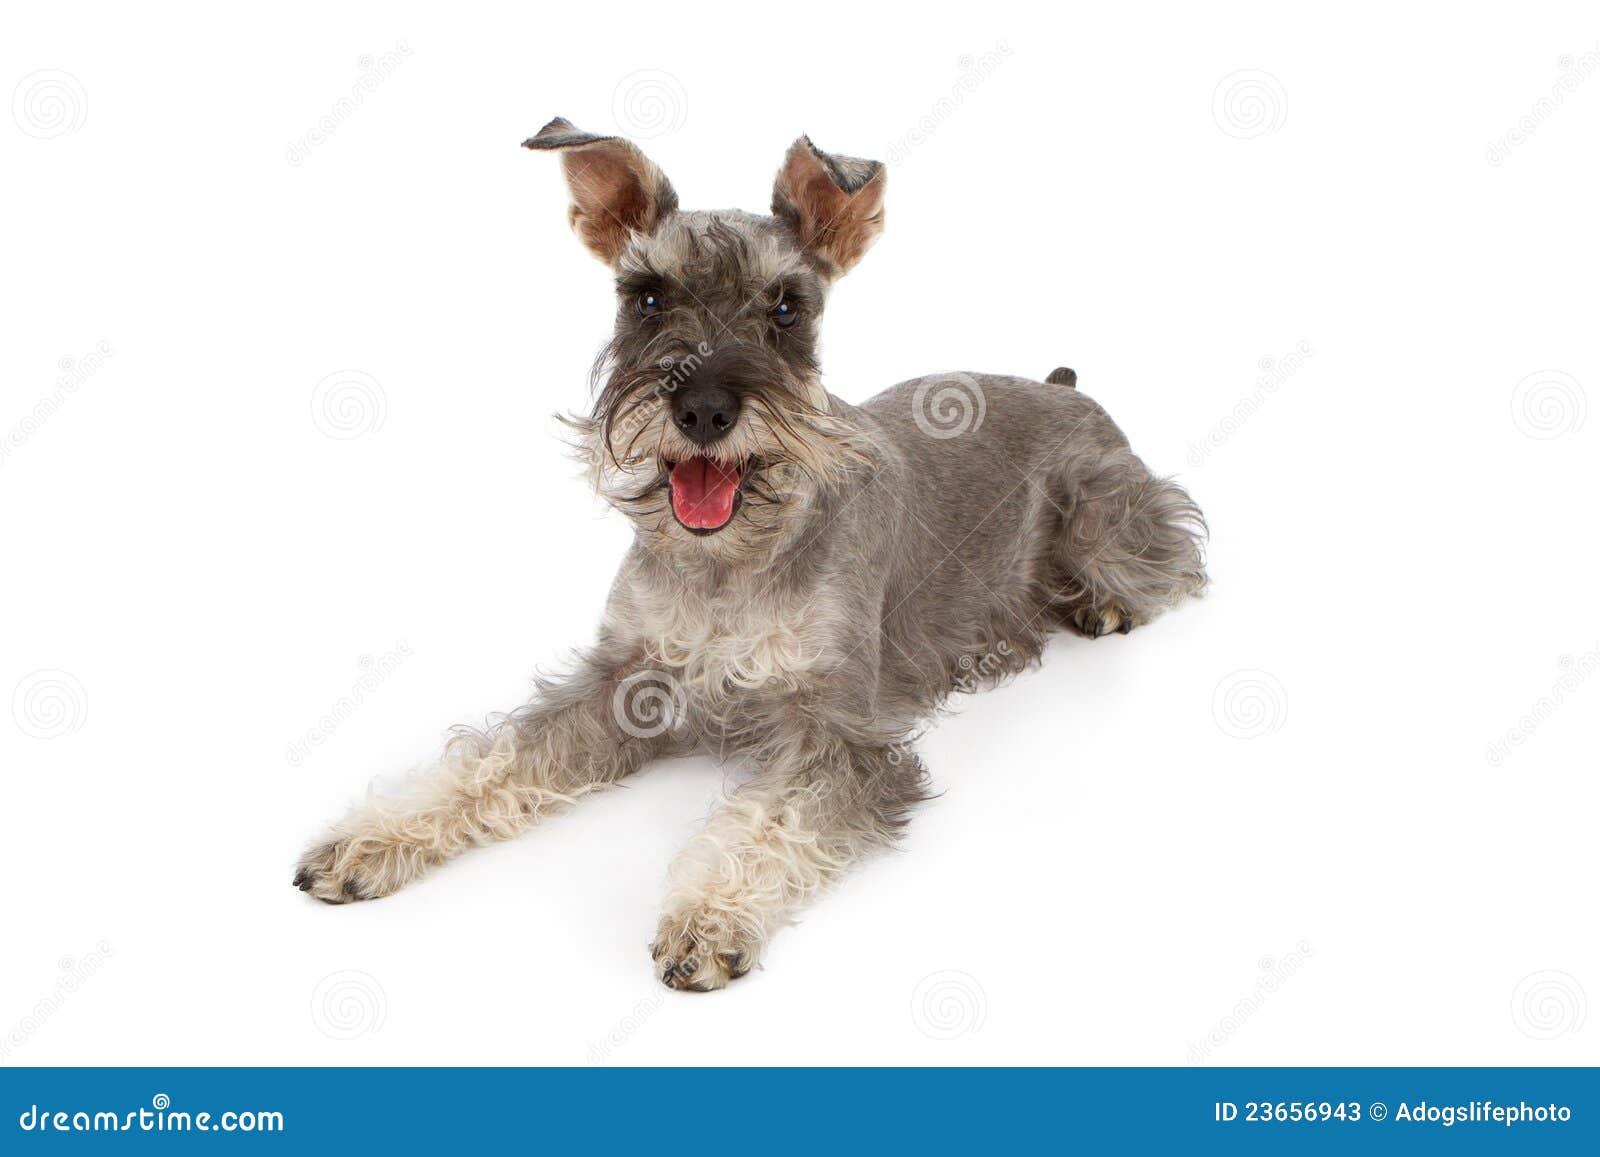 Miniature schnauzer dog laying down stock photos image 23656943